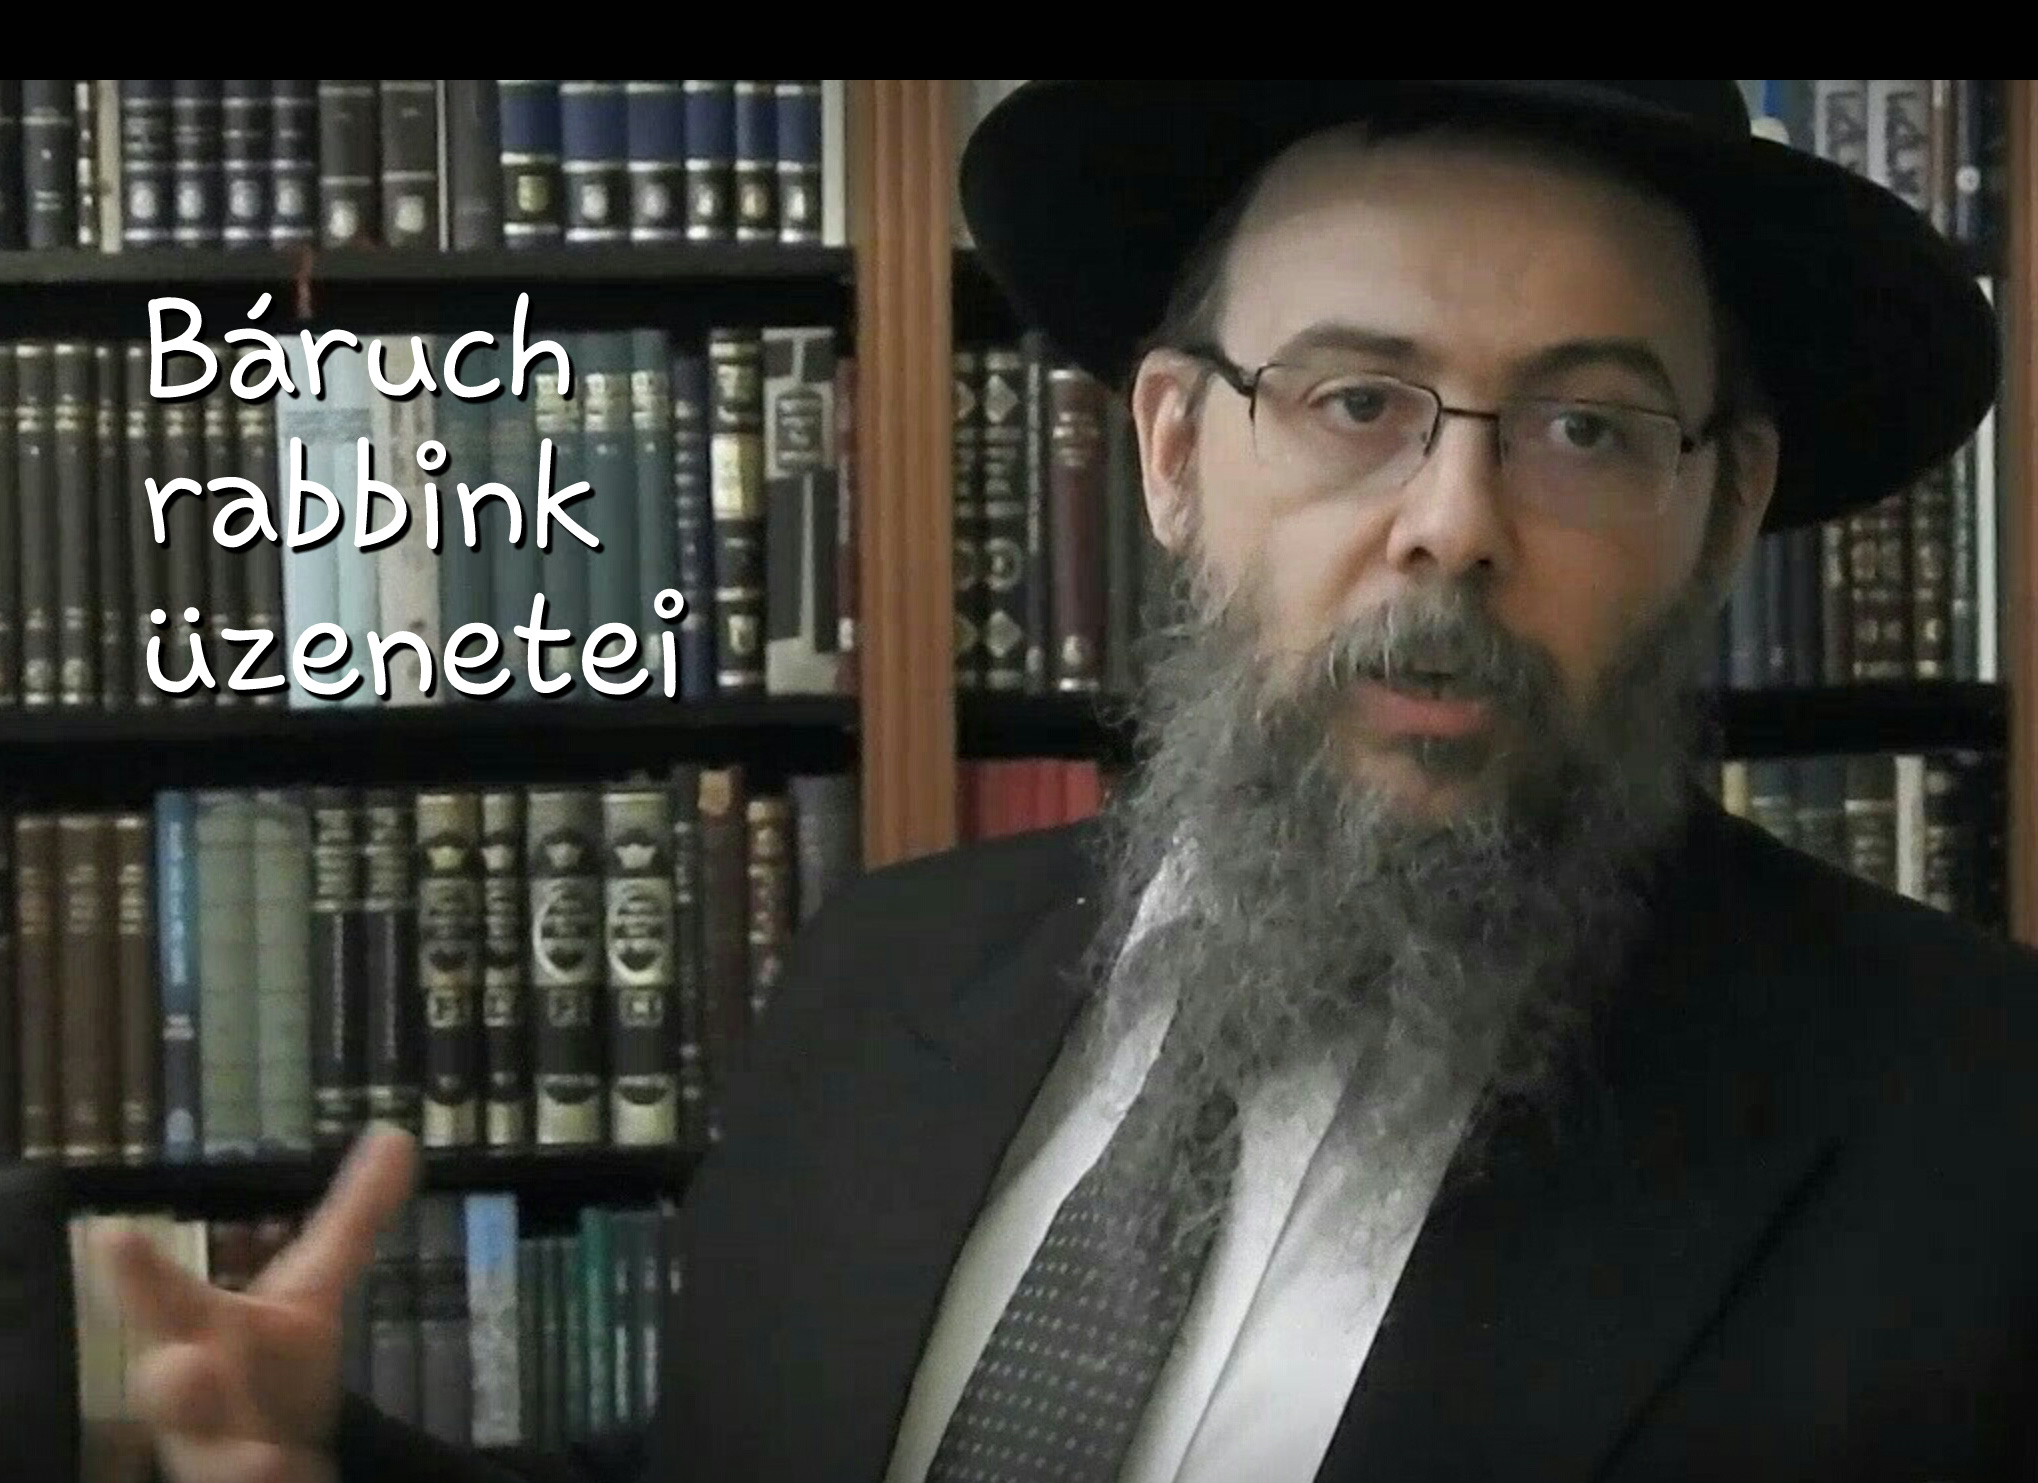 Báruch rabbink üzenetei